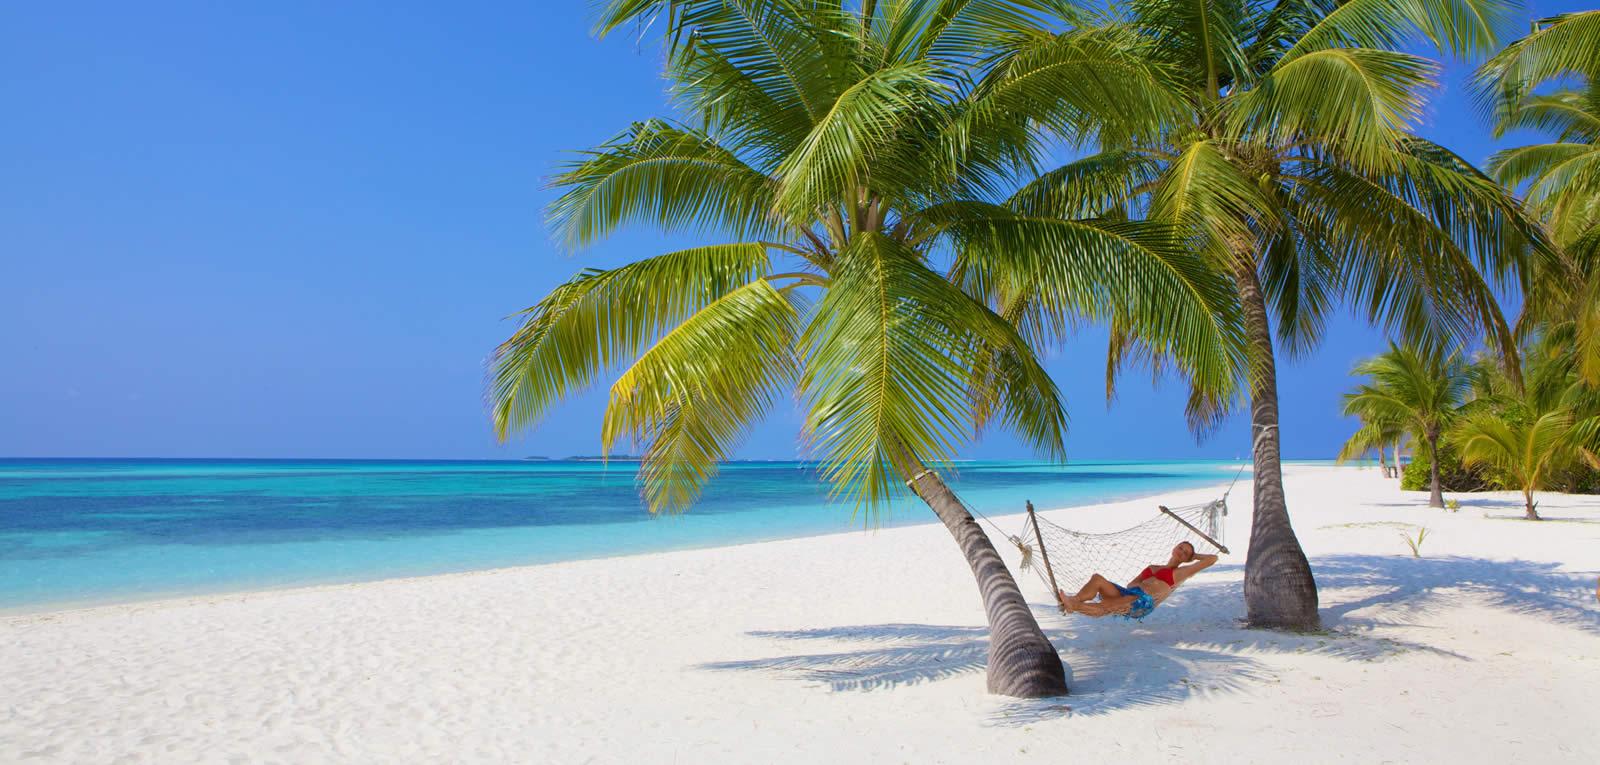 1600x765-kuredu-beach-palms